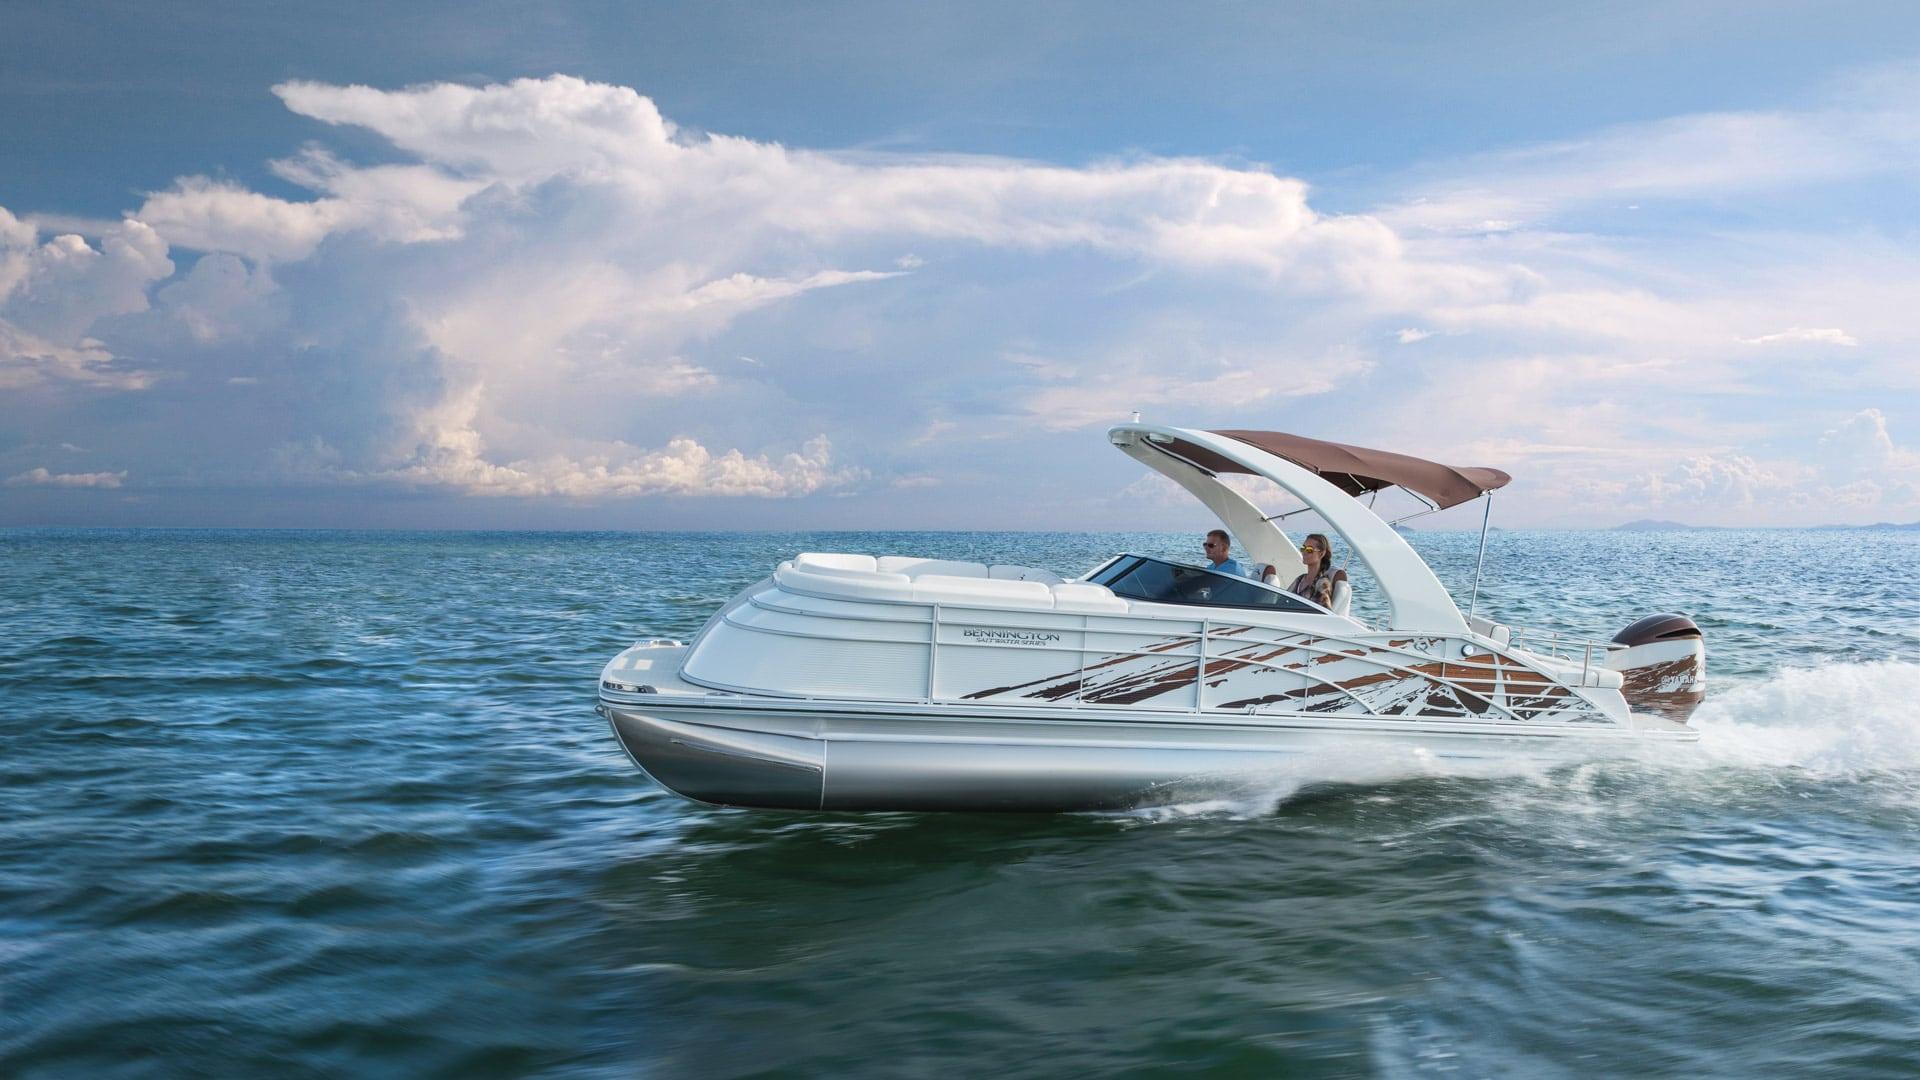 2018 Bennington Q25 Pontoon Boat Review